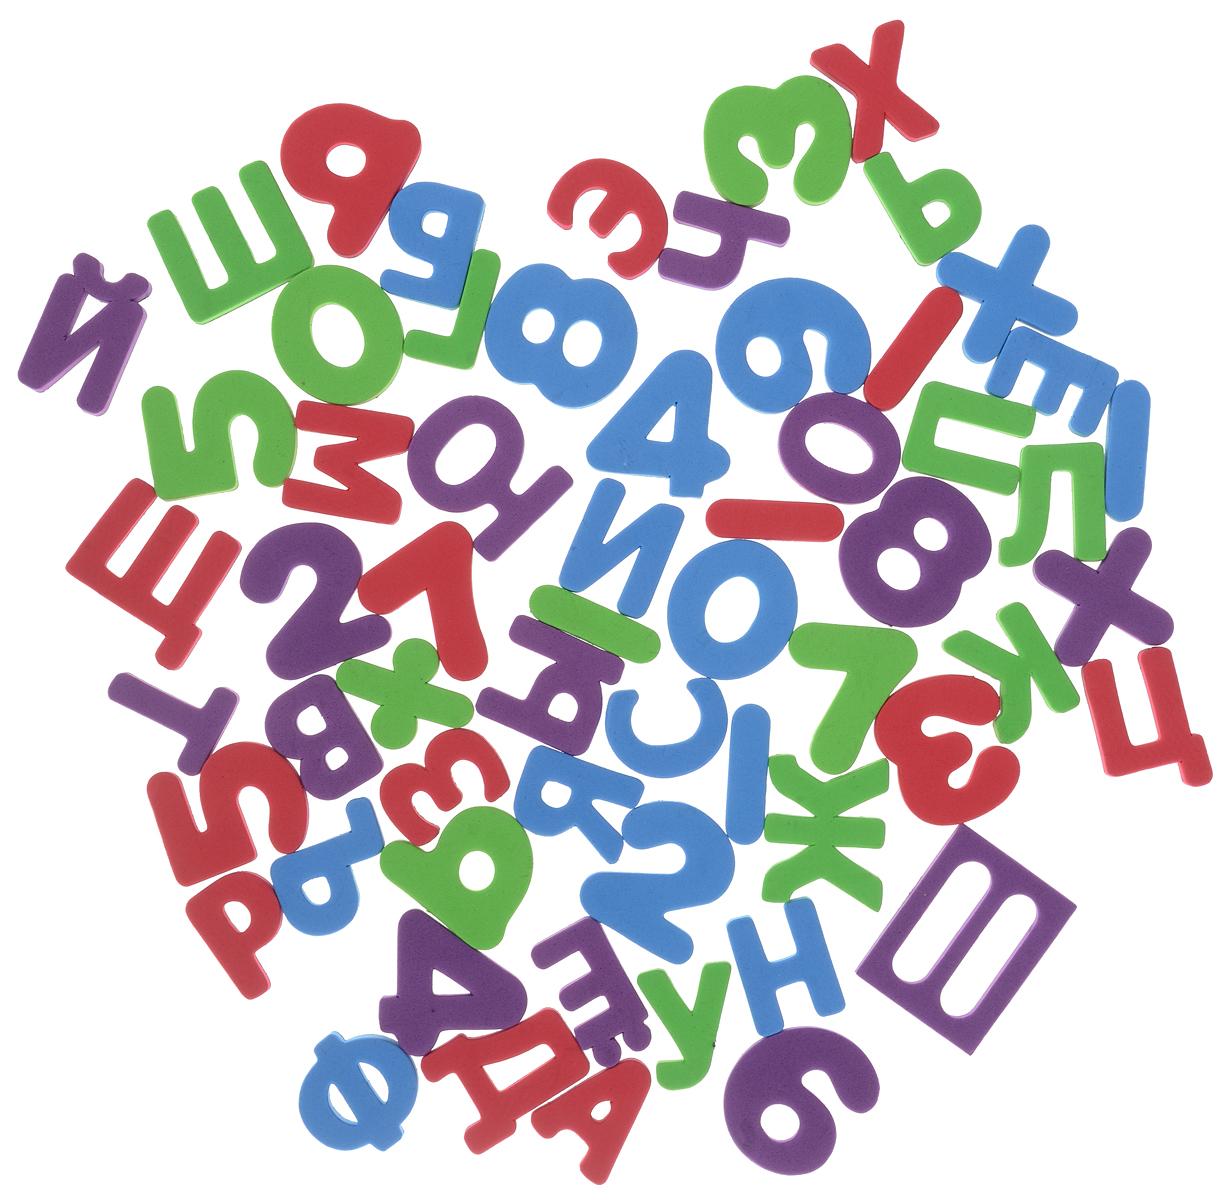 Kribly Boo Обучающая игра Магнитный набор букв и цифр веер цифр и букв